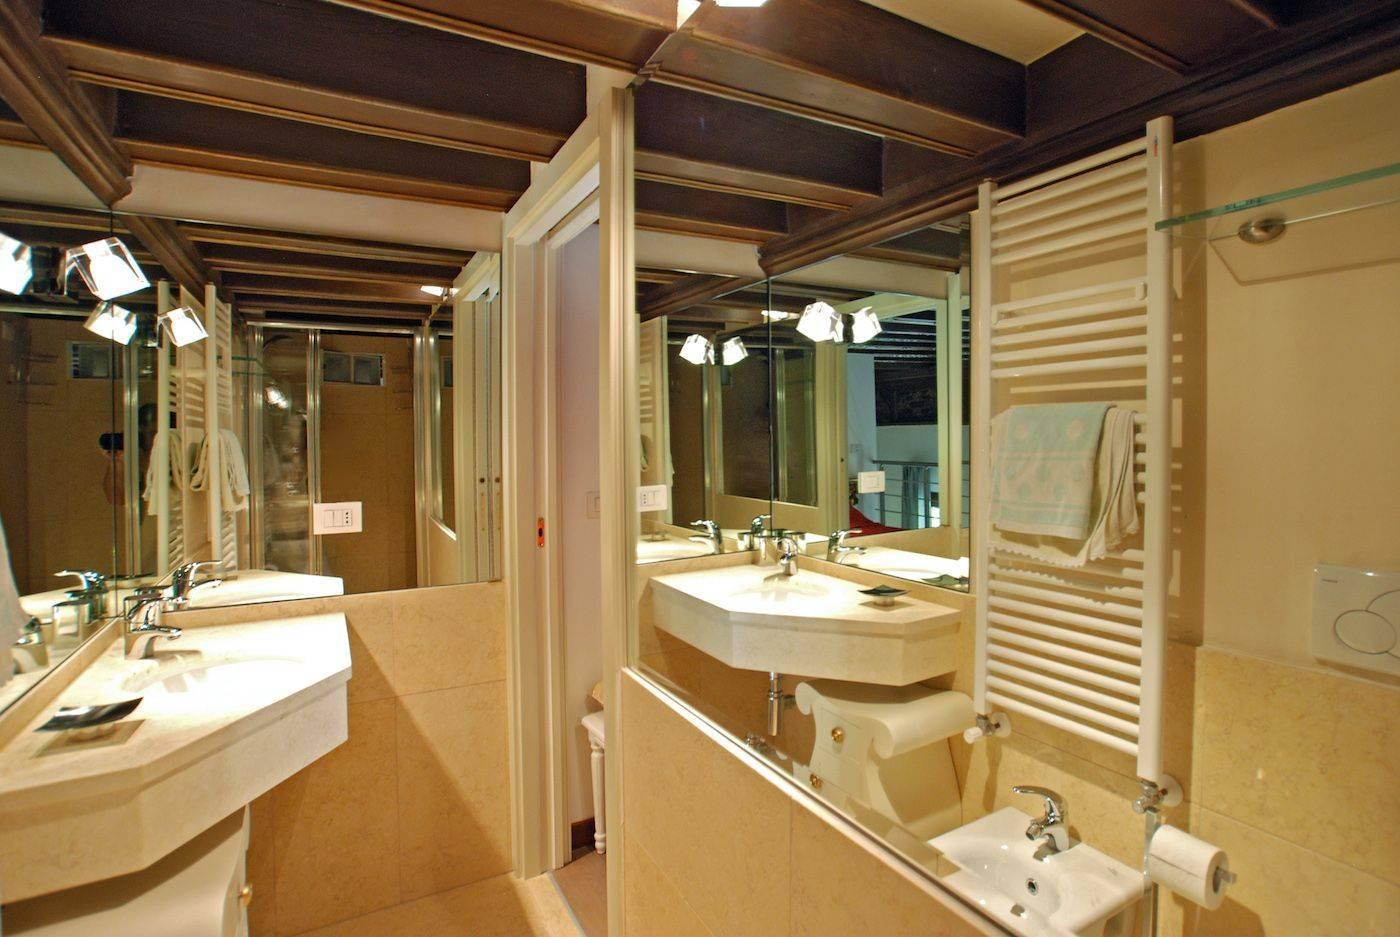 en-suite bathroom 2 with shower